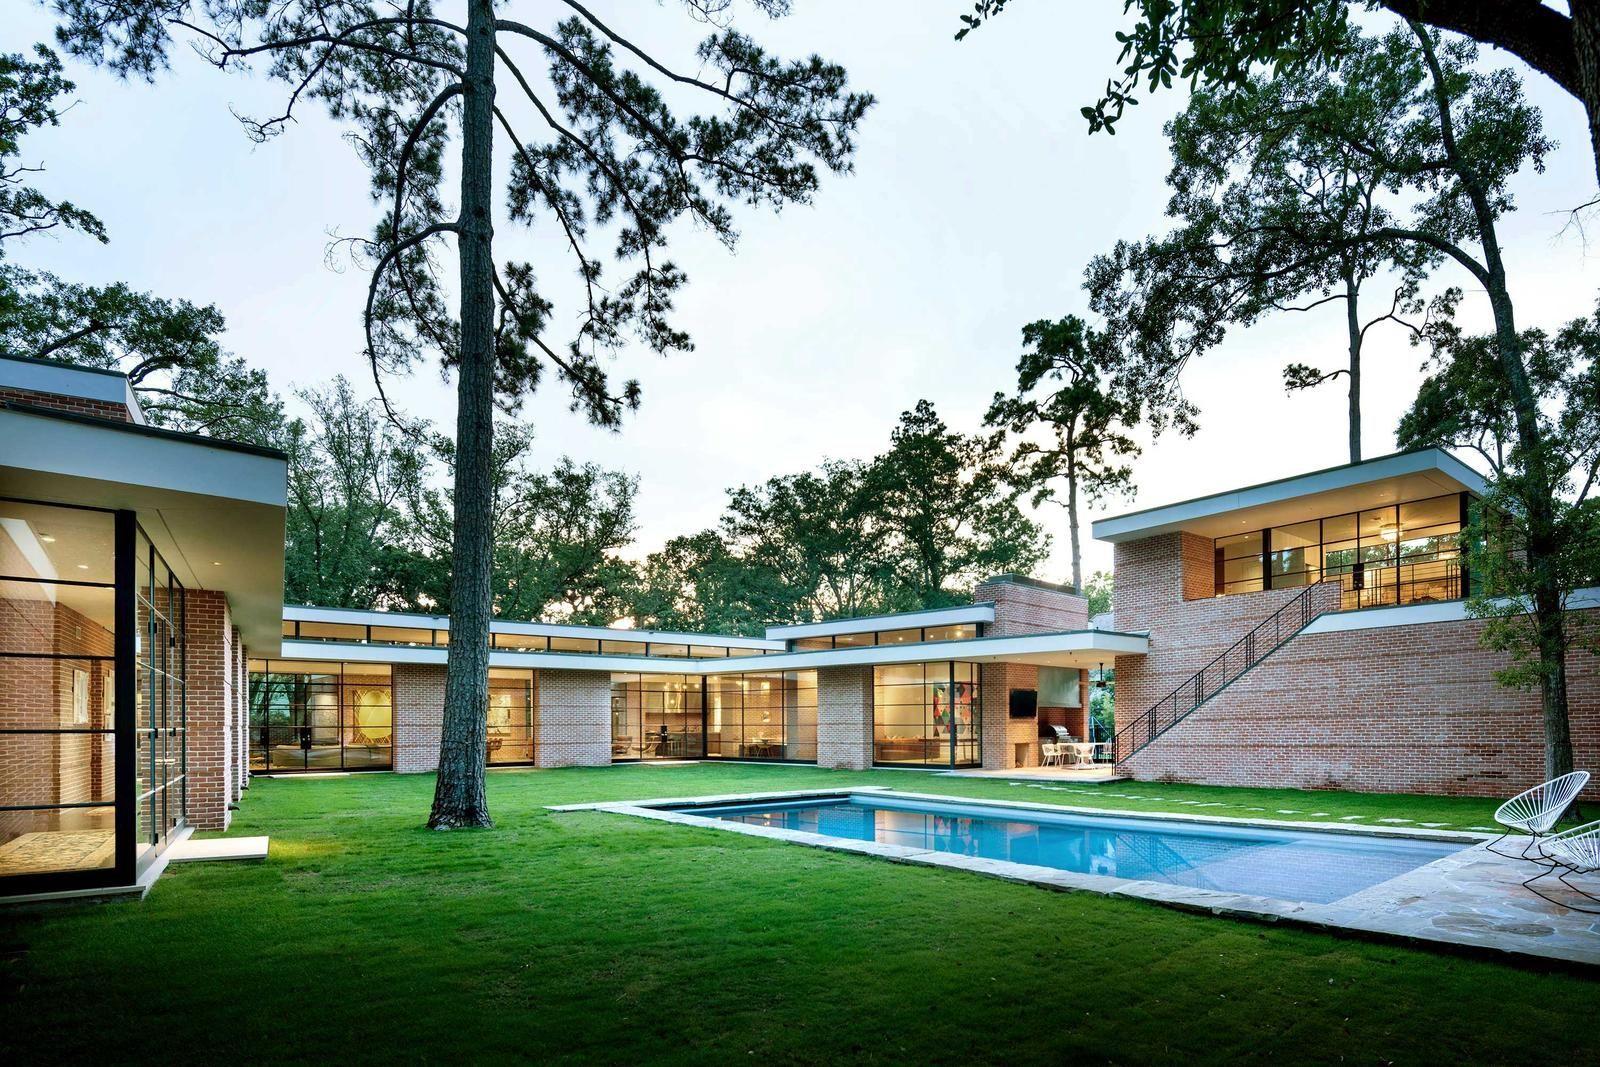 Best Kitchen Gallery: Mid Century Modern Architecture Houston Tx Oak Lane Pinterest of Mid Century Modern Homes Houston  on rachelxblog.com